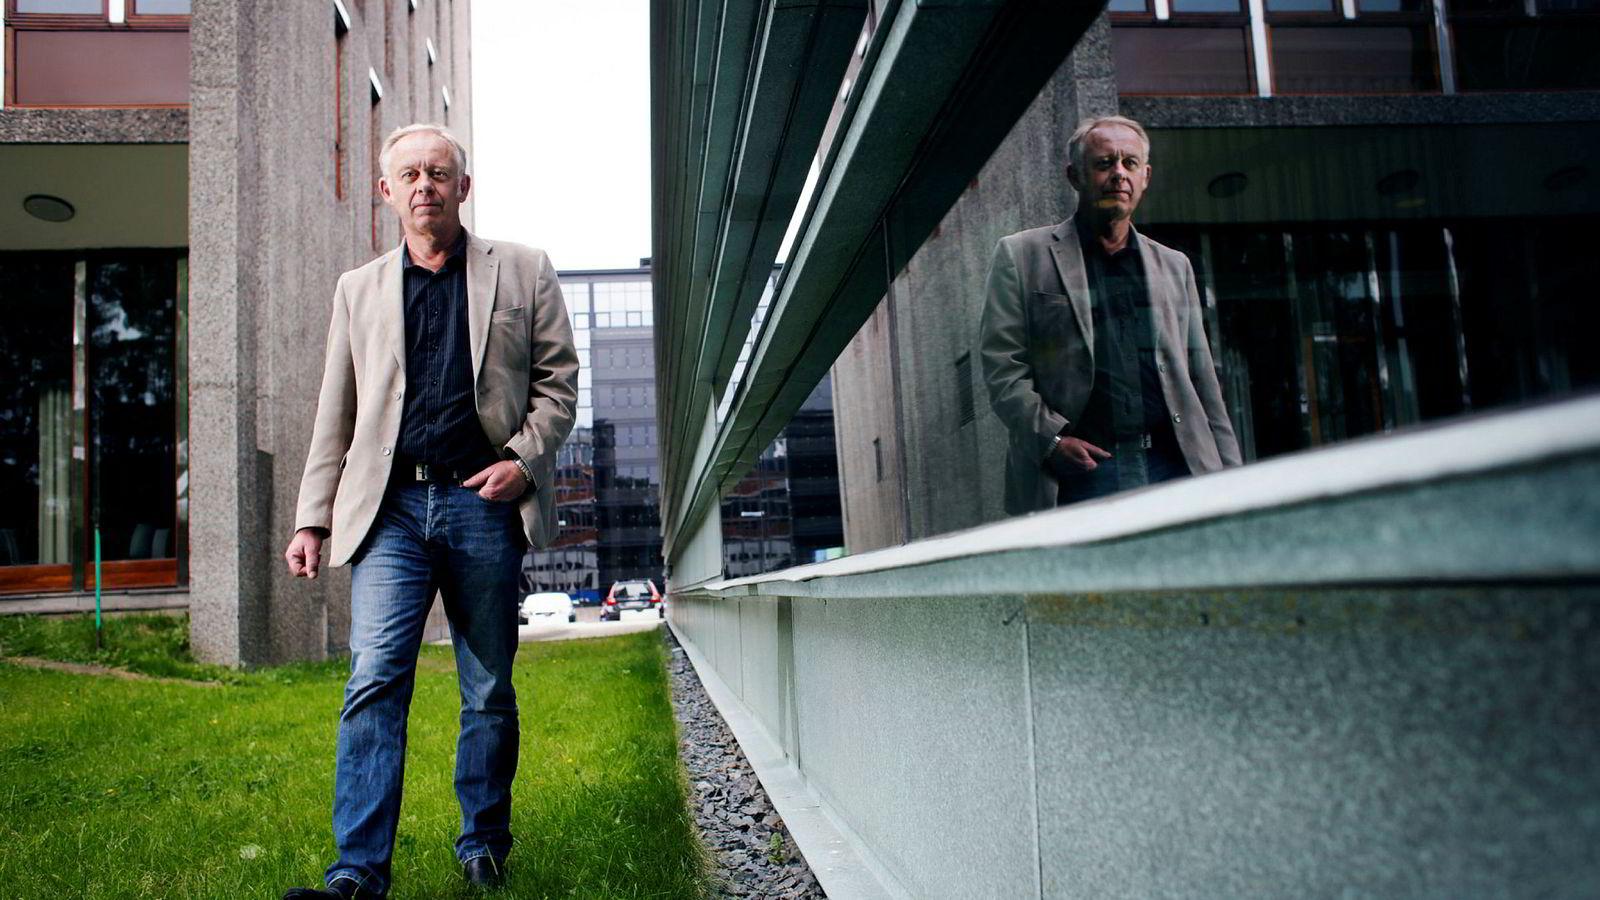 Petter Nome slutter som direktør i Bryggeri- og drikkevareforeningen, og går over i en friere stilling som rådgiver,